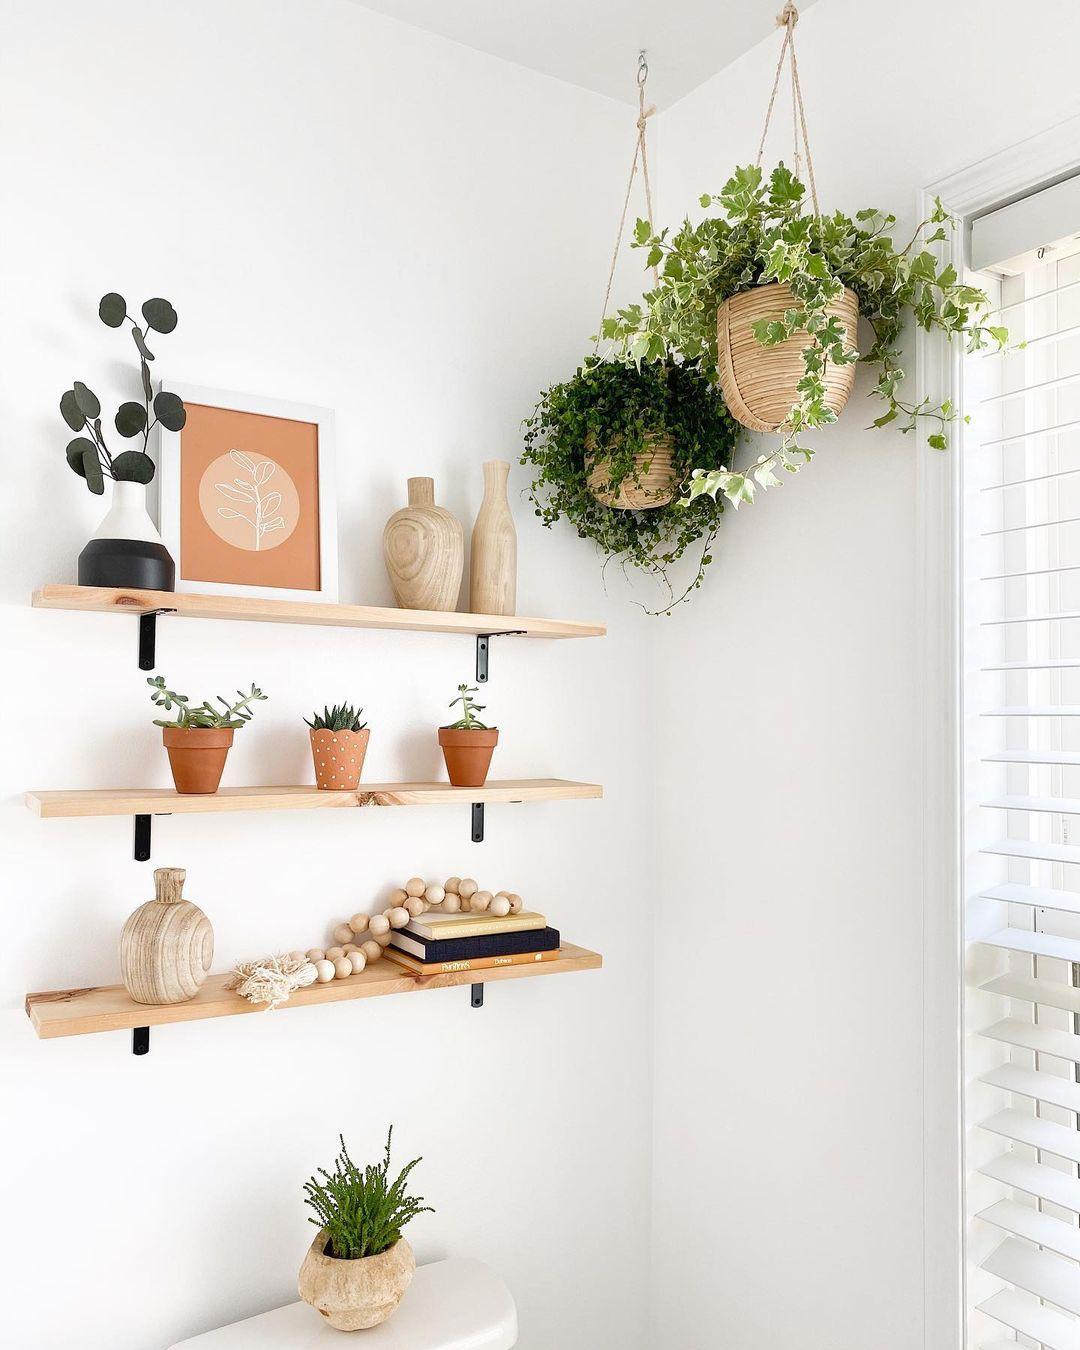 Ivy hanging in basket